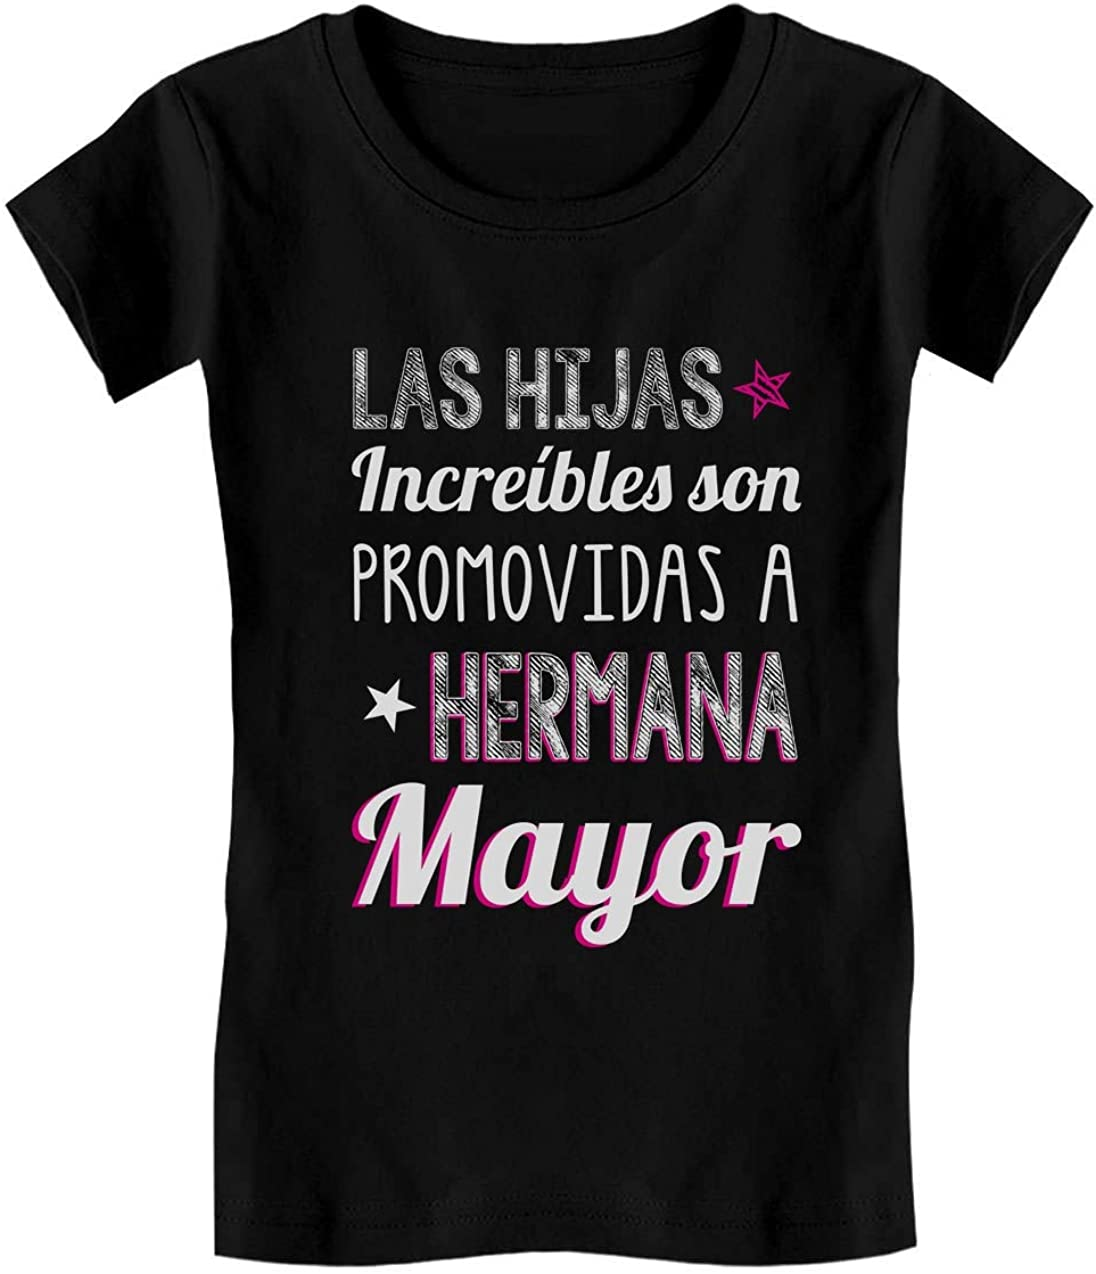 Camiseta de Manga Corta para niñas - - Las Hijas Increíbles Son Promovidas a Hermana Mayor - Regalo Original para niñas Que serán Hermanas Mayores